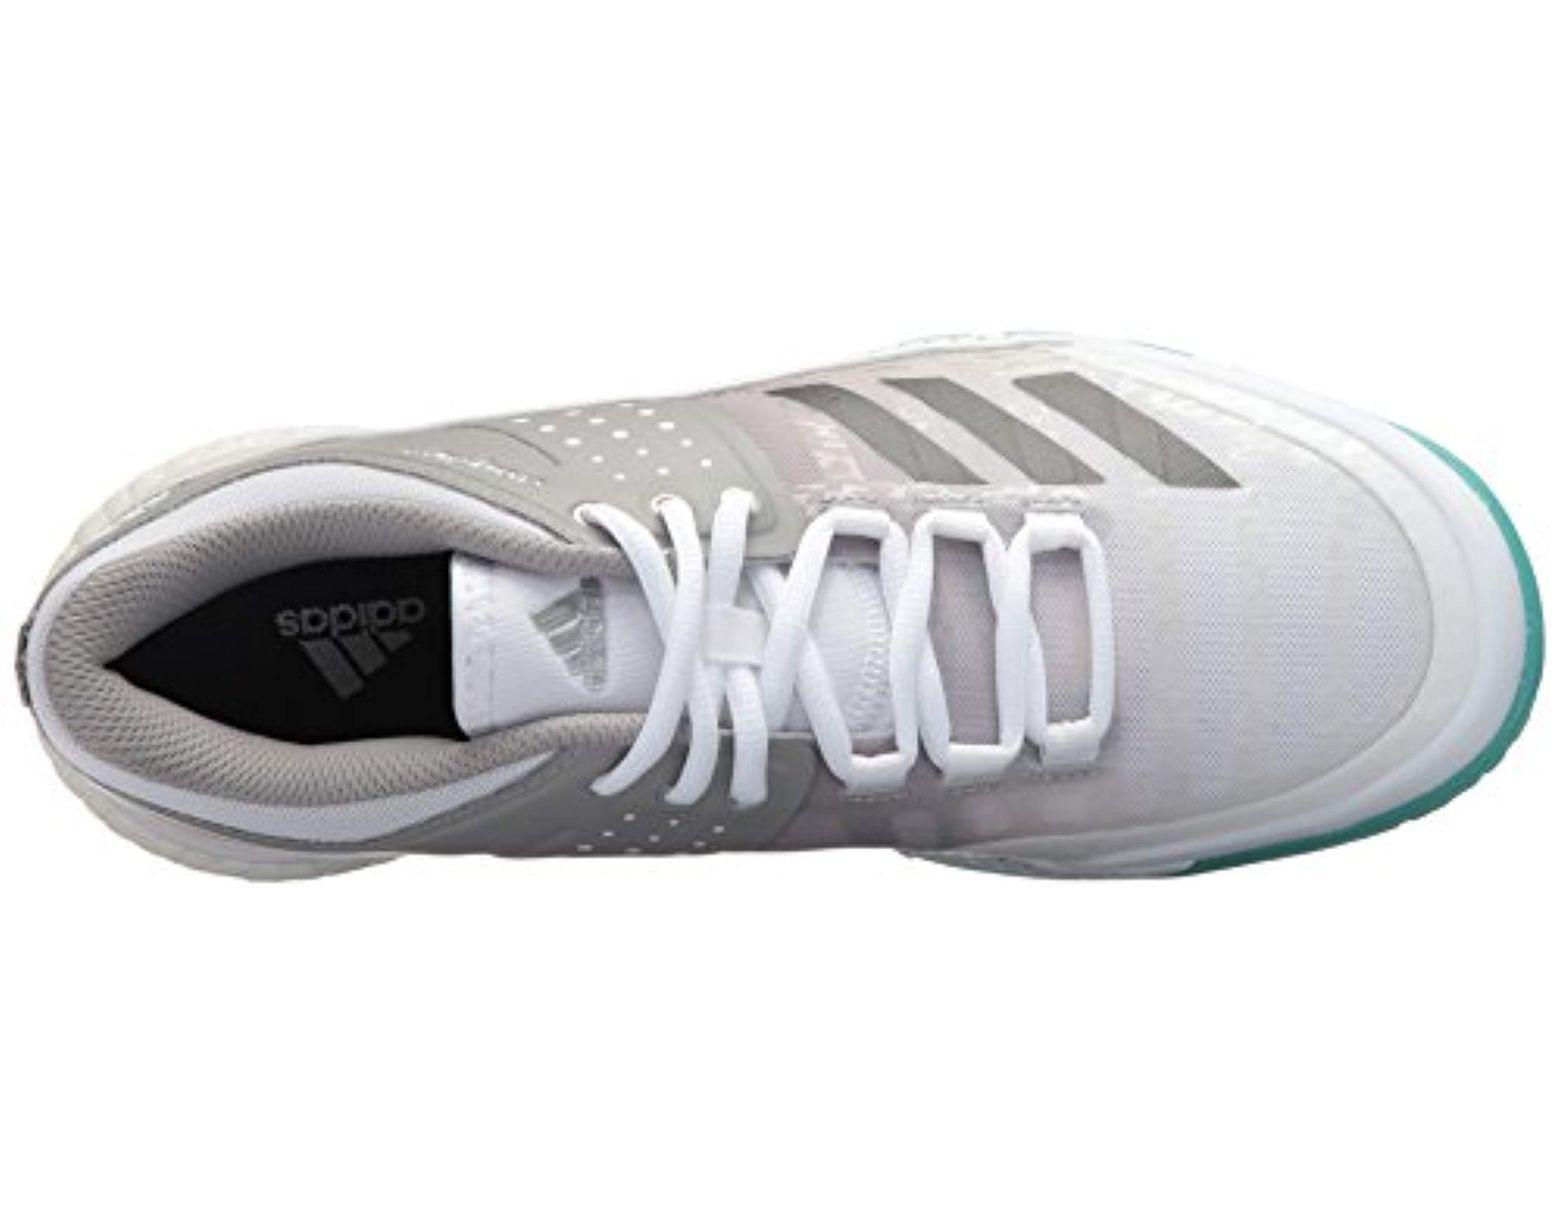 fd264ad25 adidas Crazyflight X Volleyball Shoe - Lyst